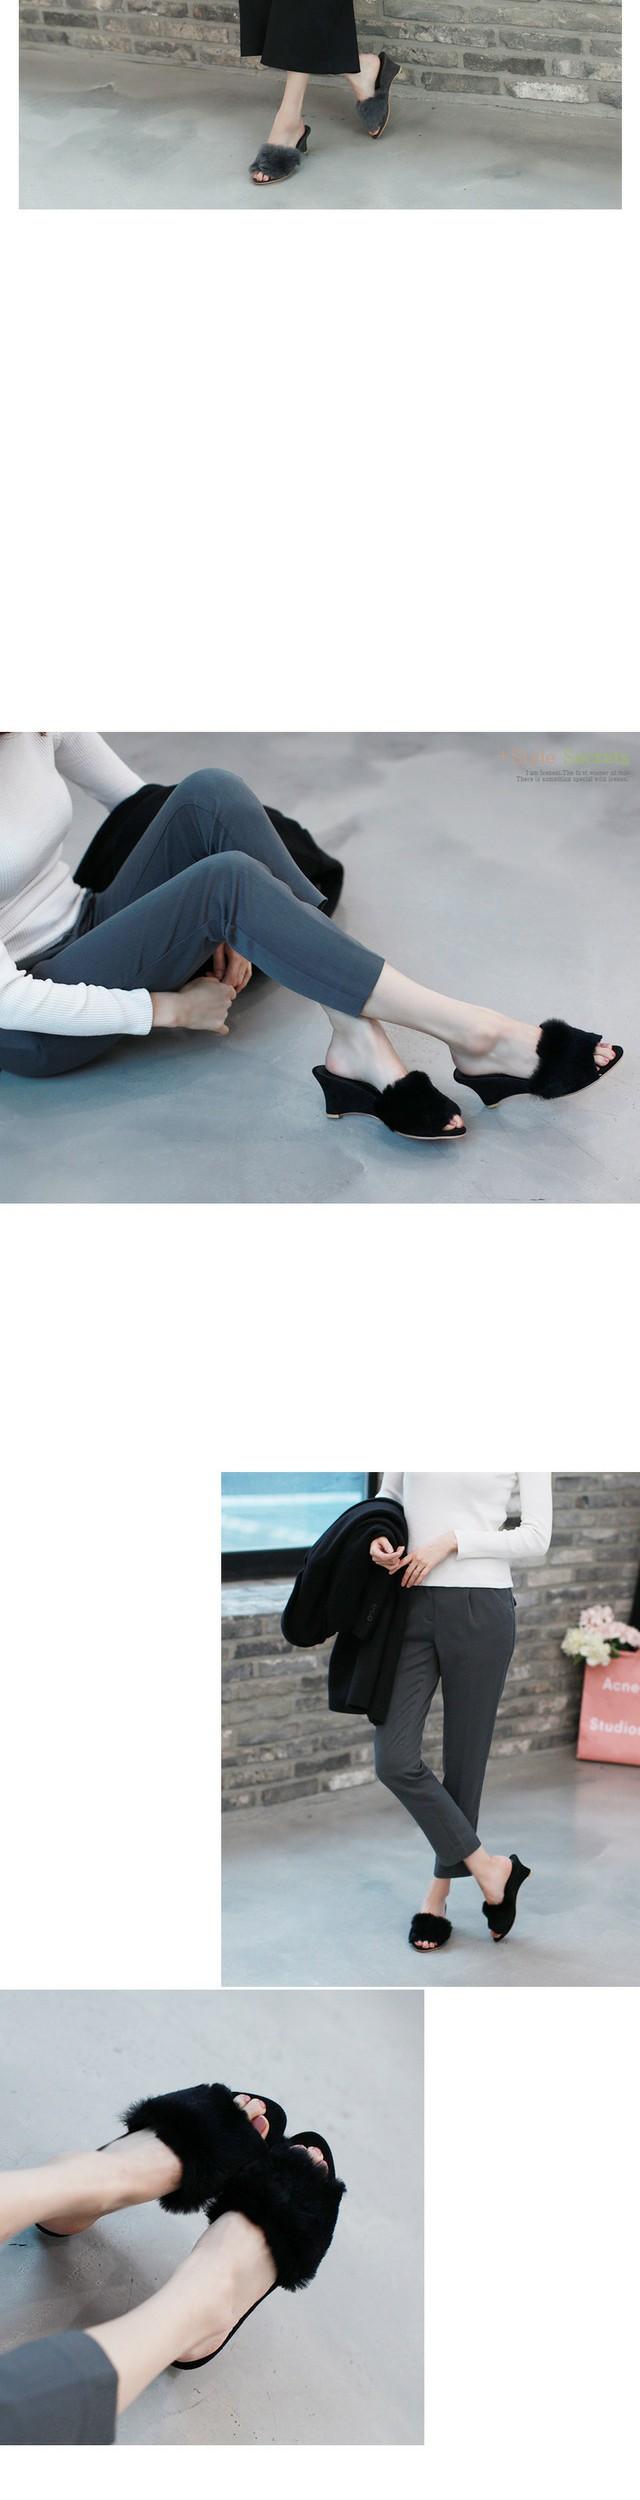 Jaradipur Wedge Slippers 6cm